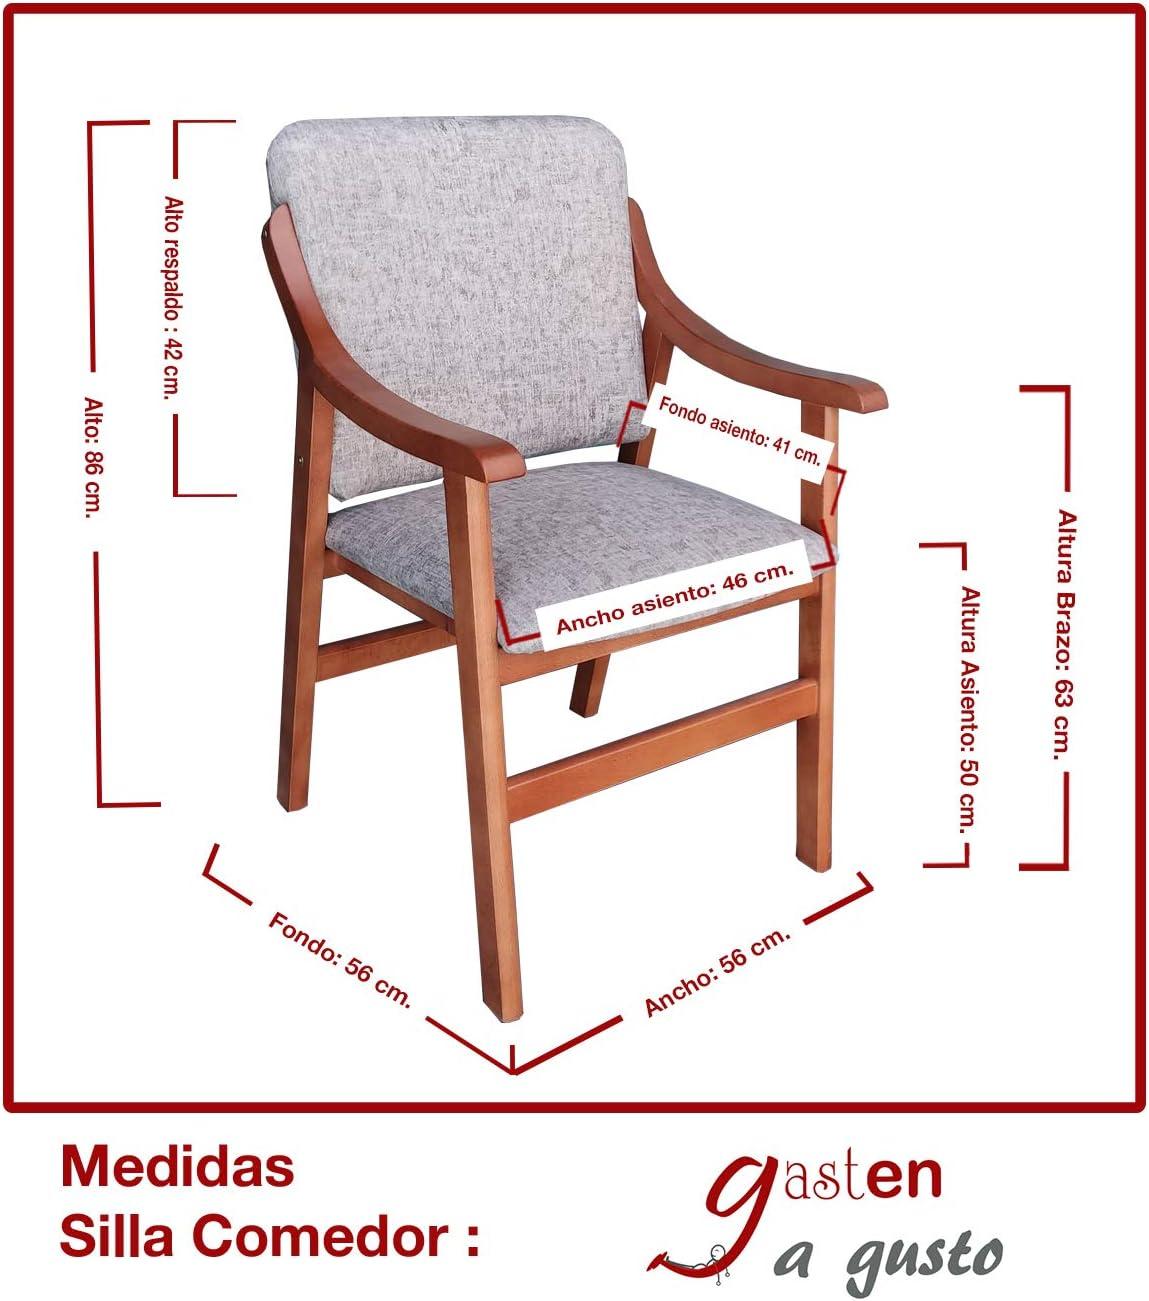 medidas estandar respaldo silla comedor